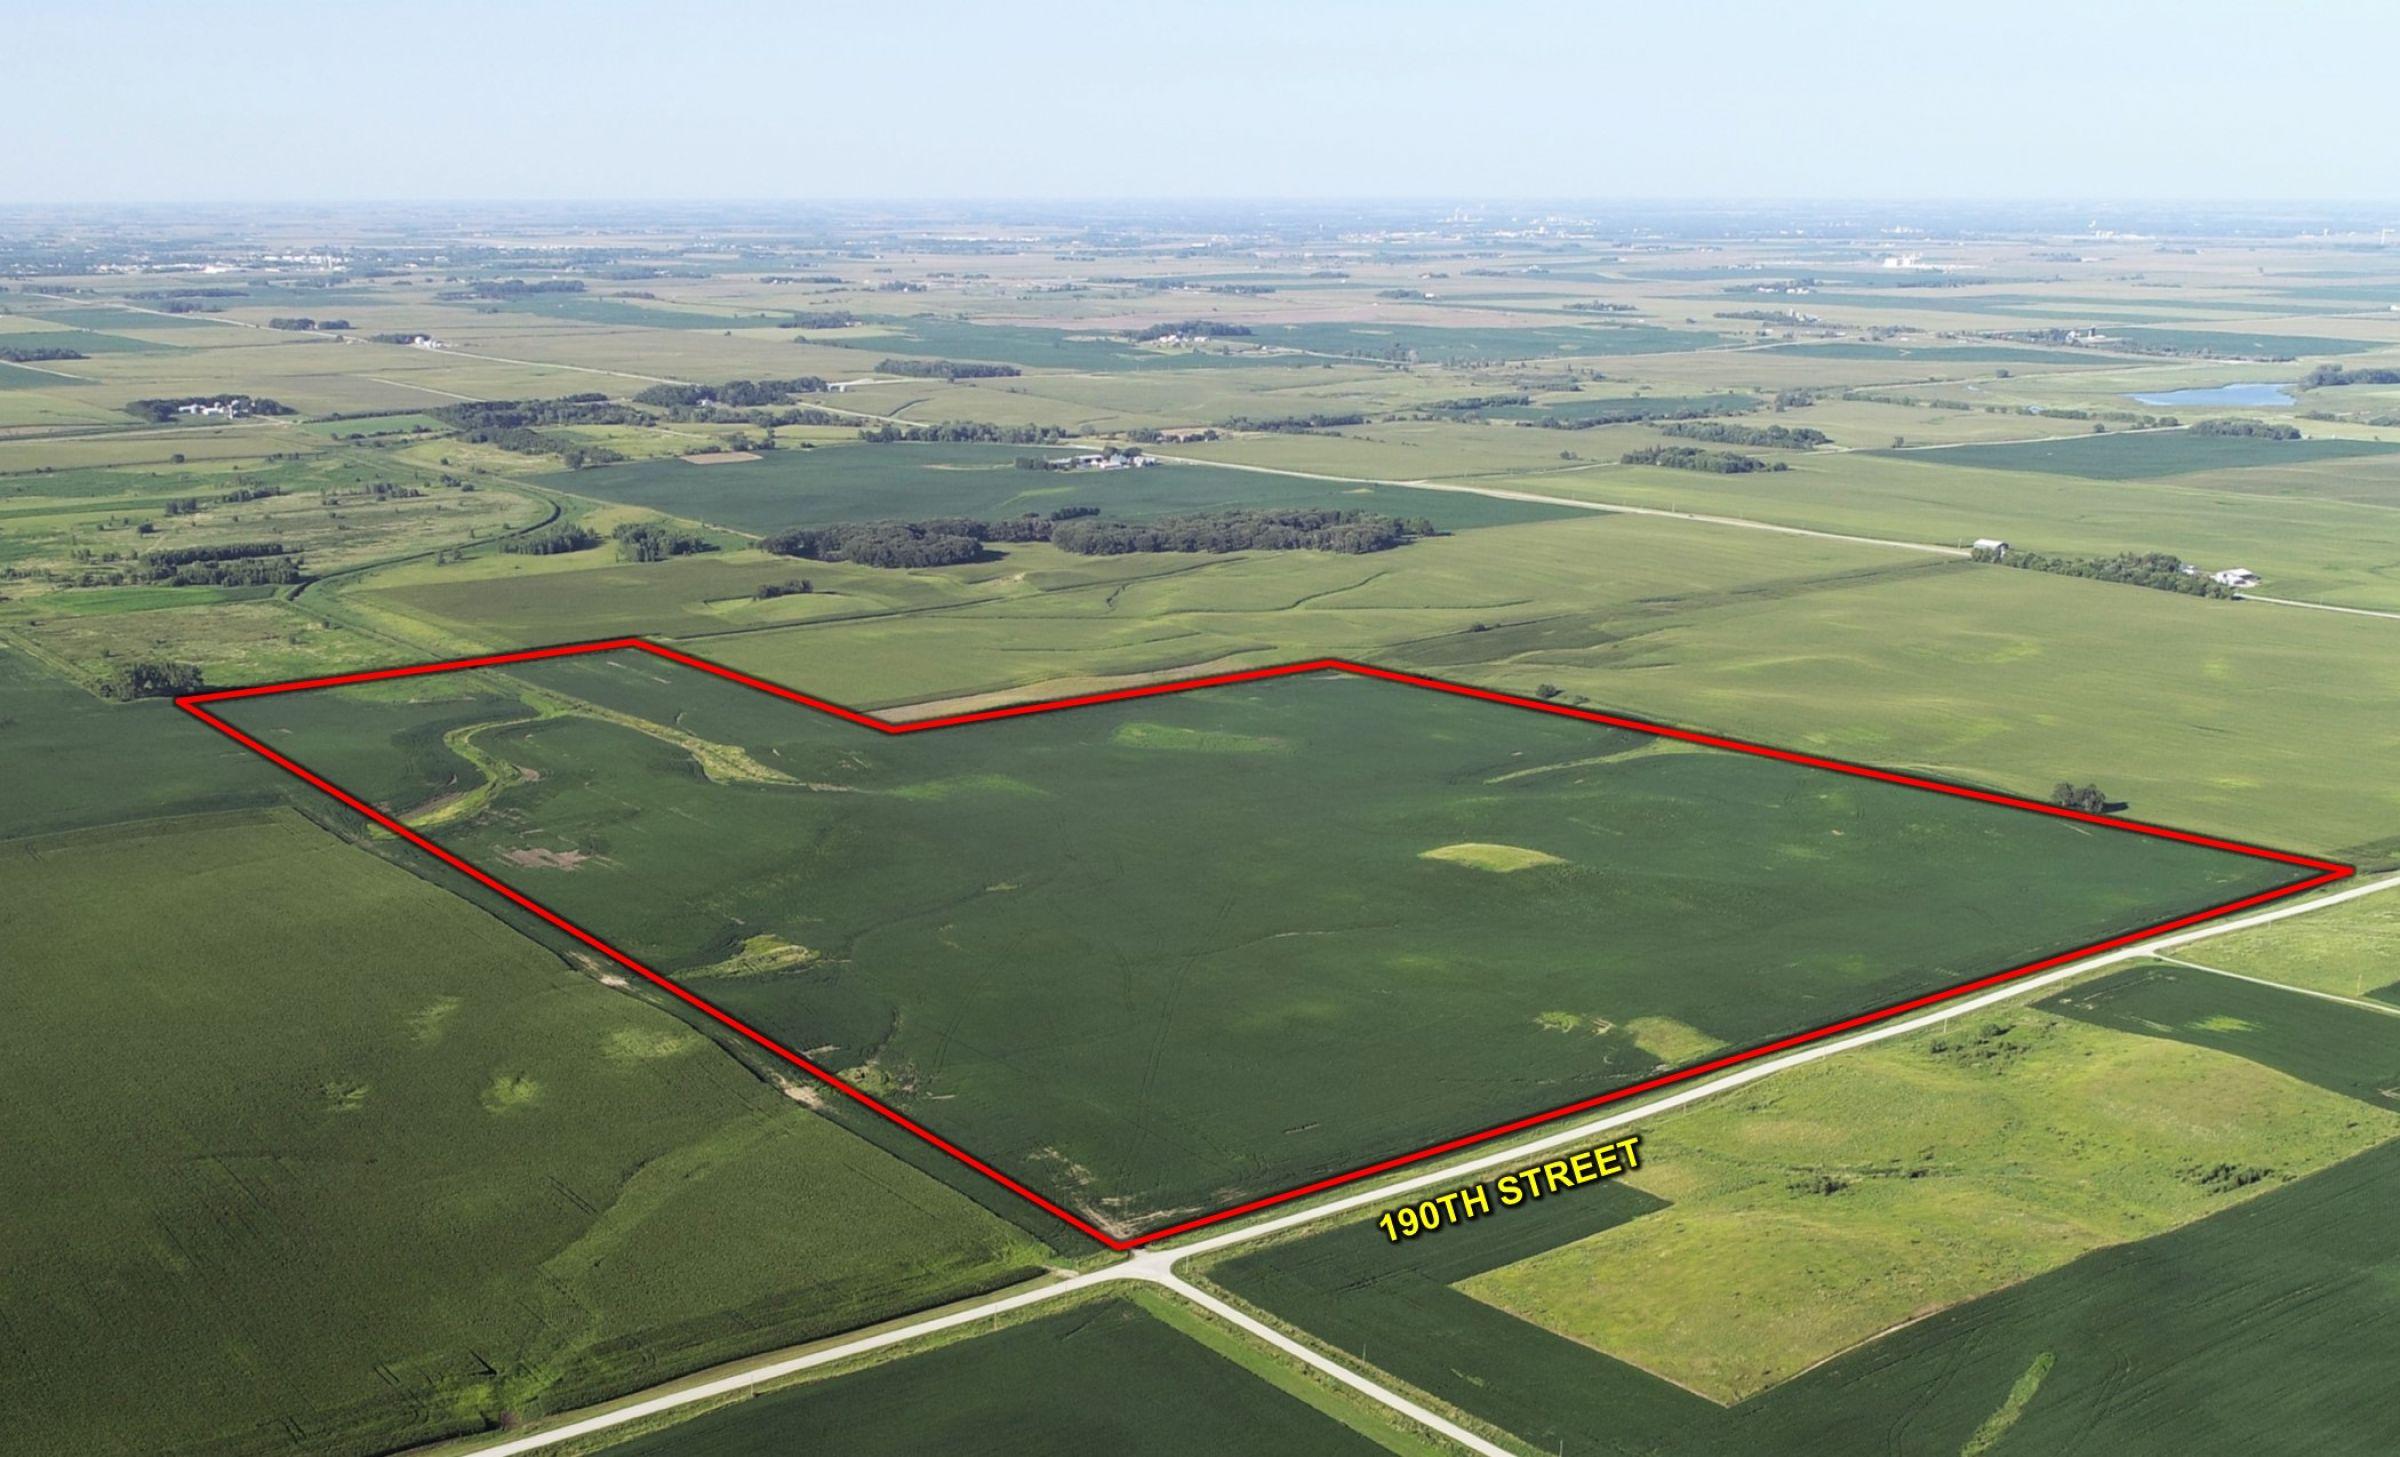 14763-cerro-gordo-farmland-for-sale-200-acres-ml-1-2019-11-07-180006.jpg